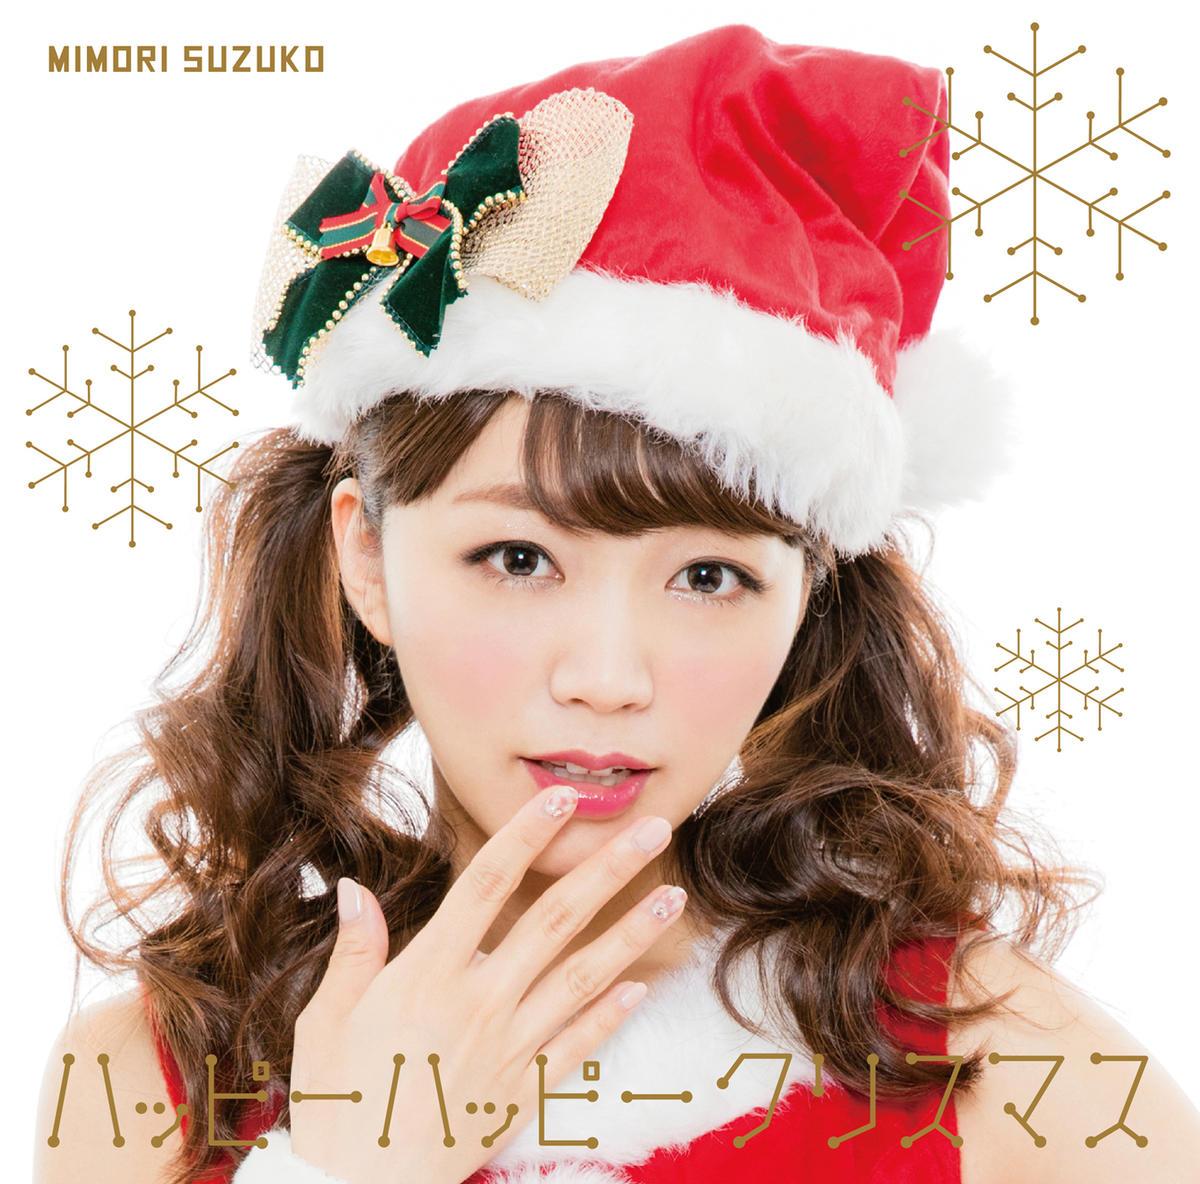 20151218.02.1 Suzuko Mimori - Happy Happy Christmas cover.jpg